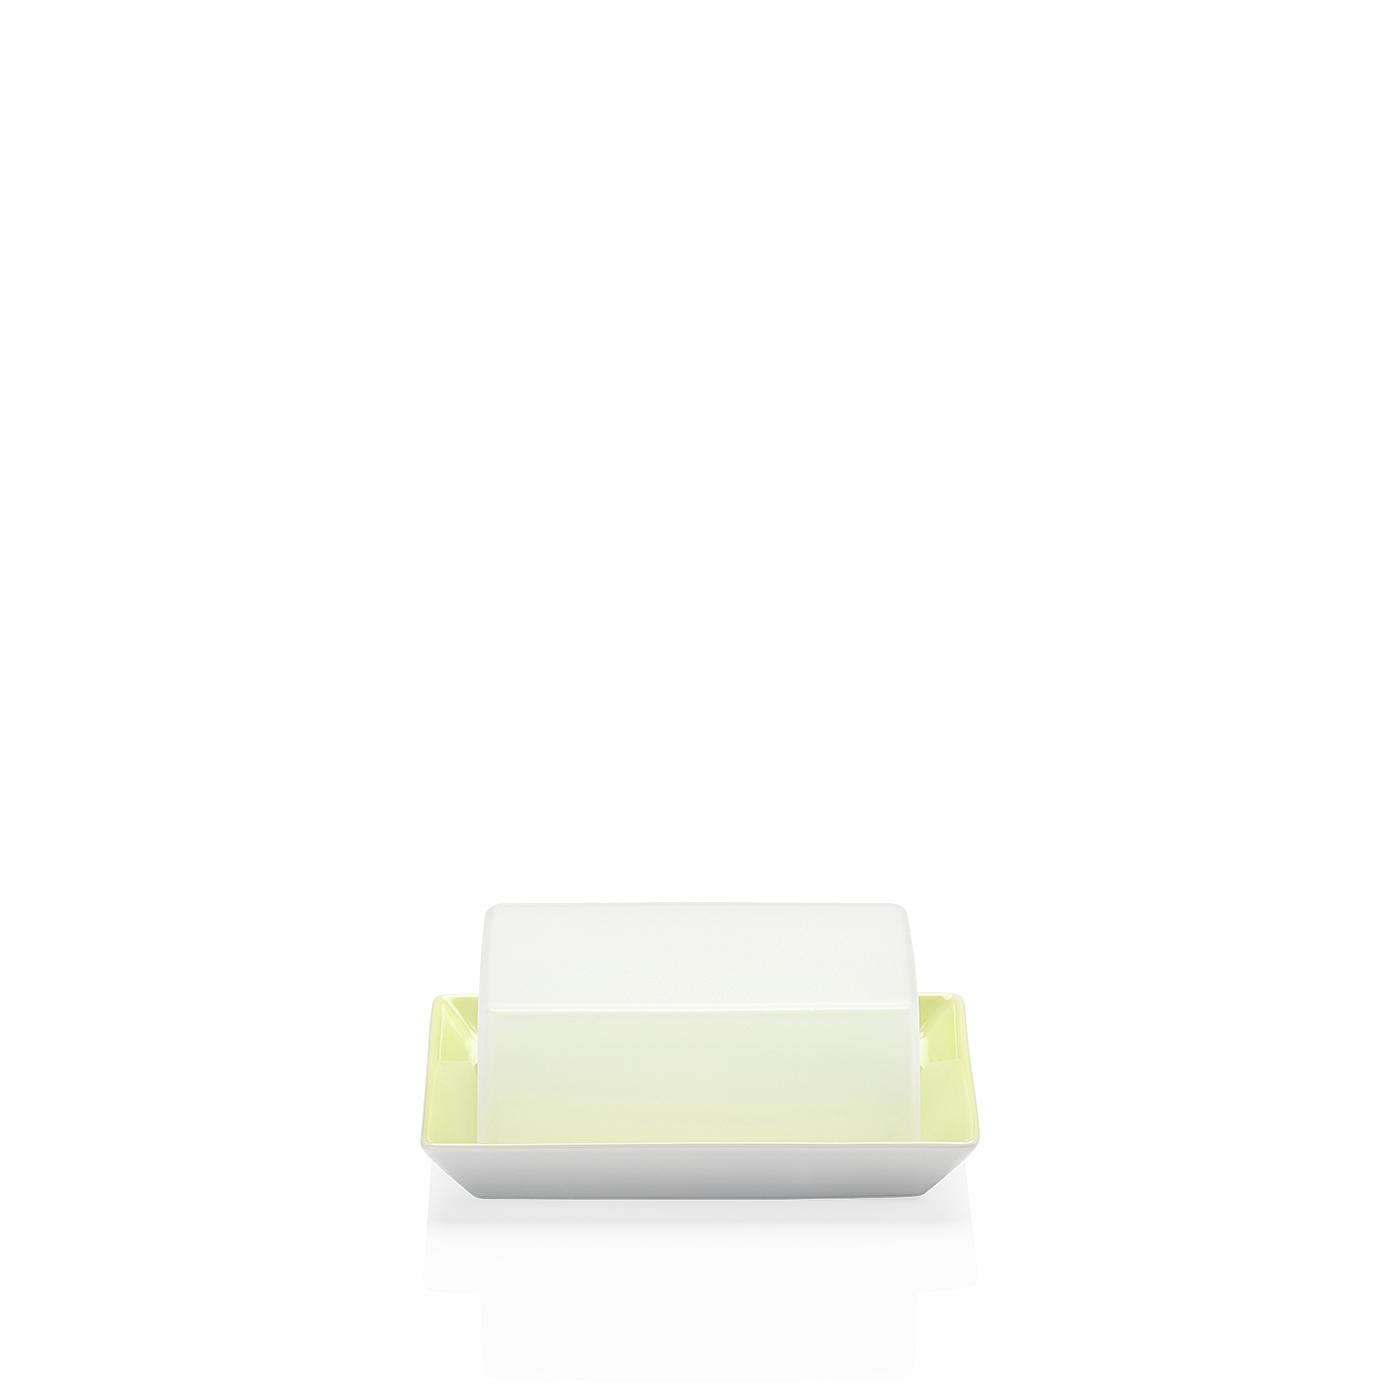 Butterdose Tric Grün Arzberg